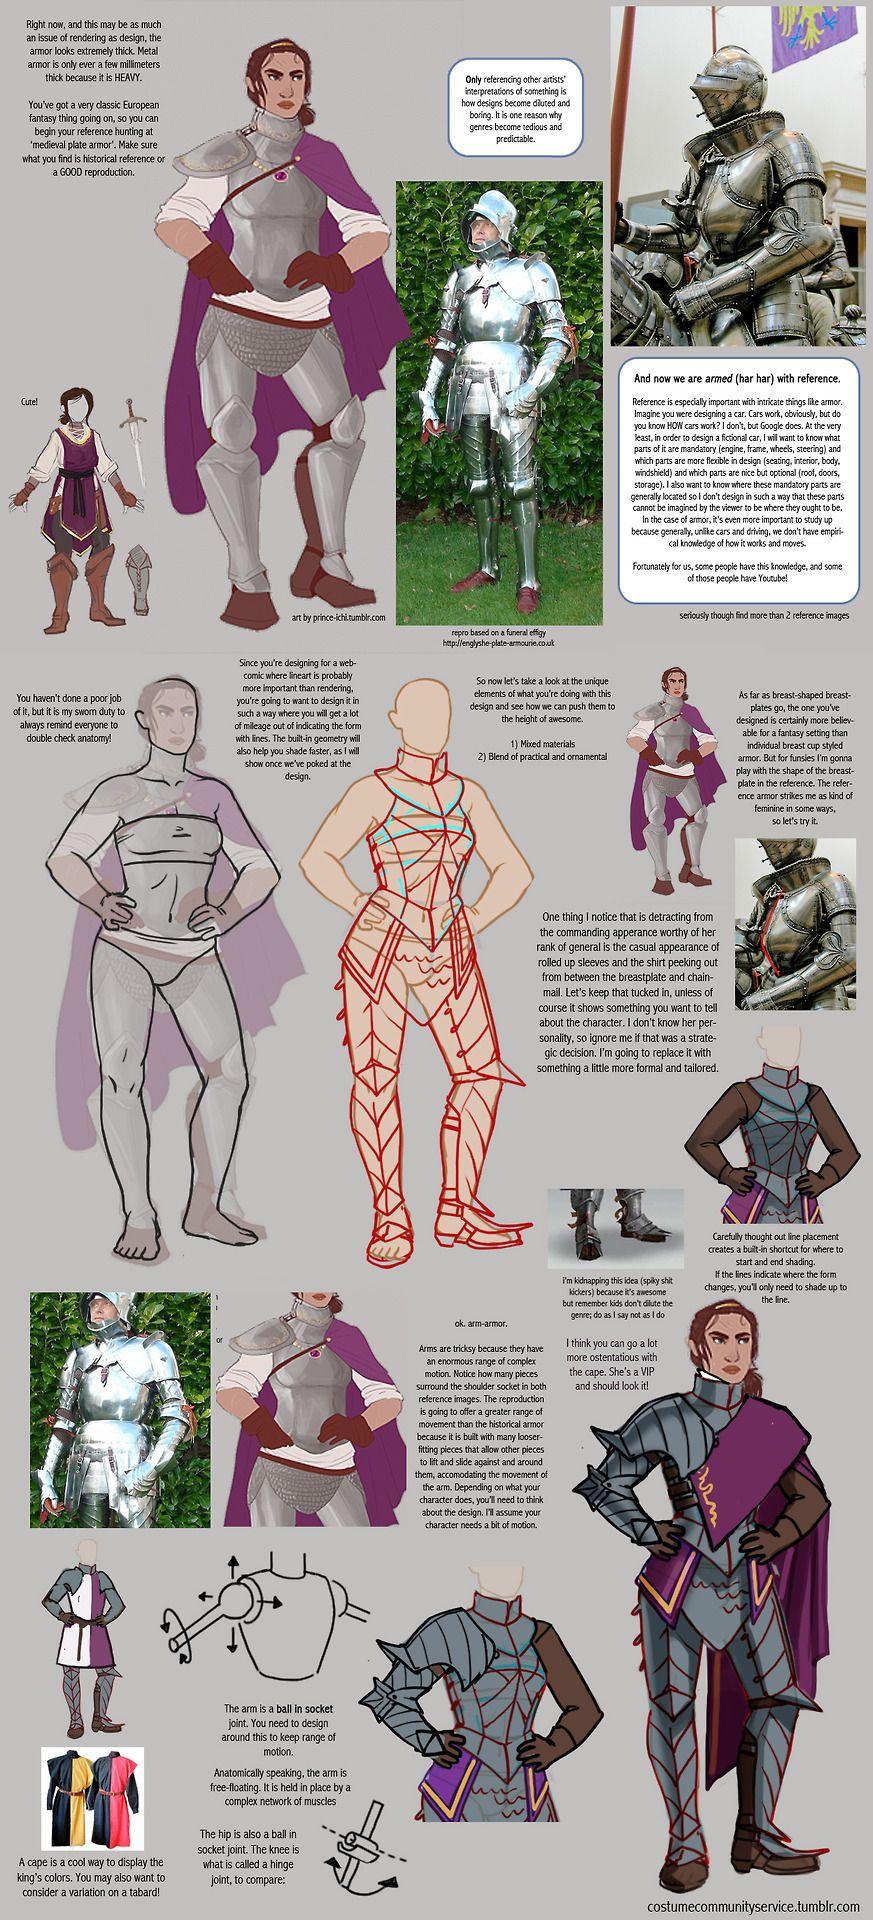 Bikini Armor Battle Damage : bikini, armor, battle, damage, Bikini, Armor, Battle, Damage, Photo, Historical, Armor,, Drawing,, Character, Design